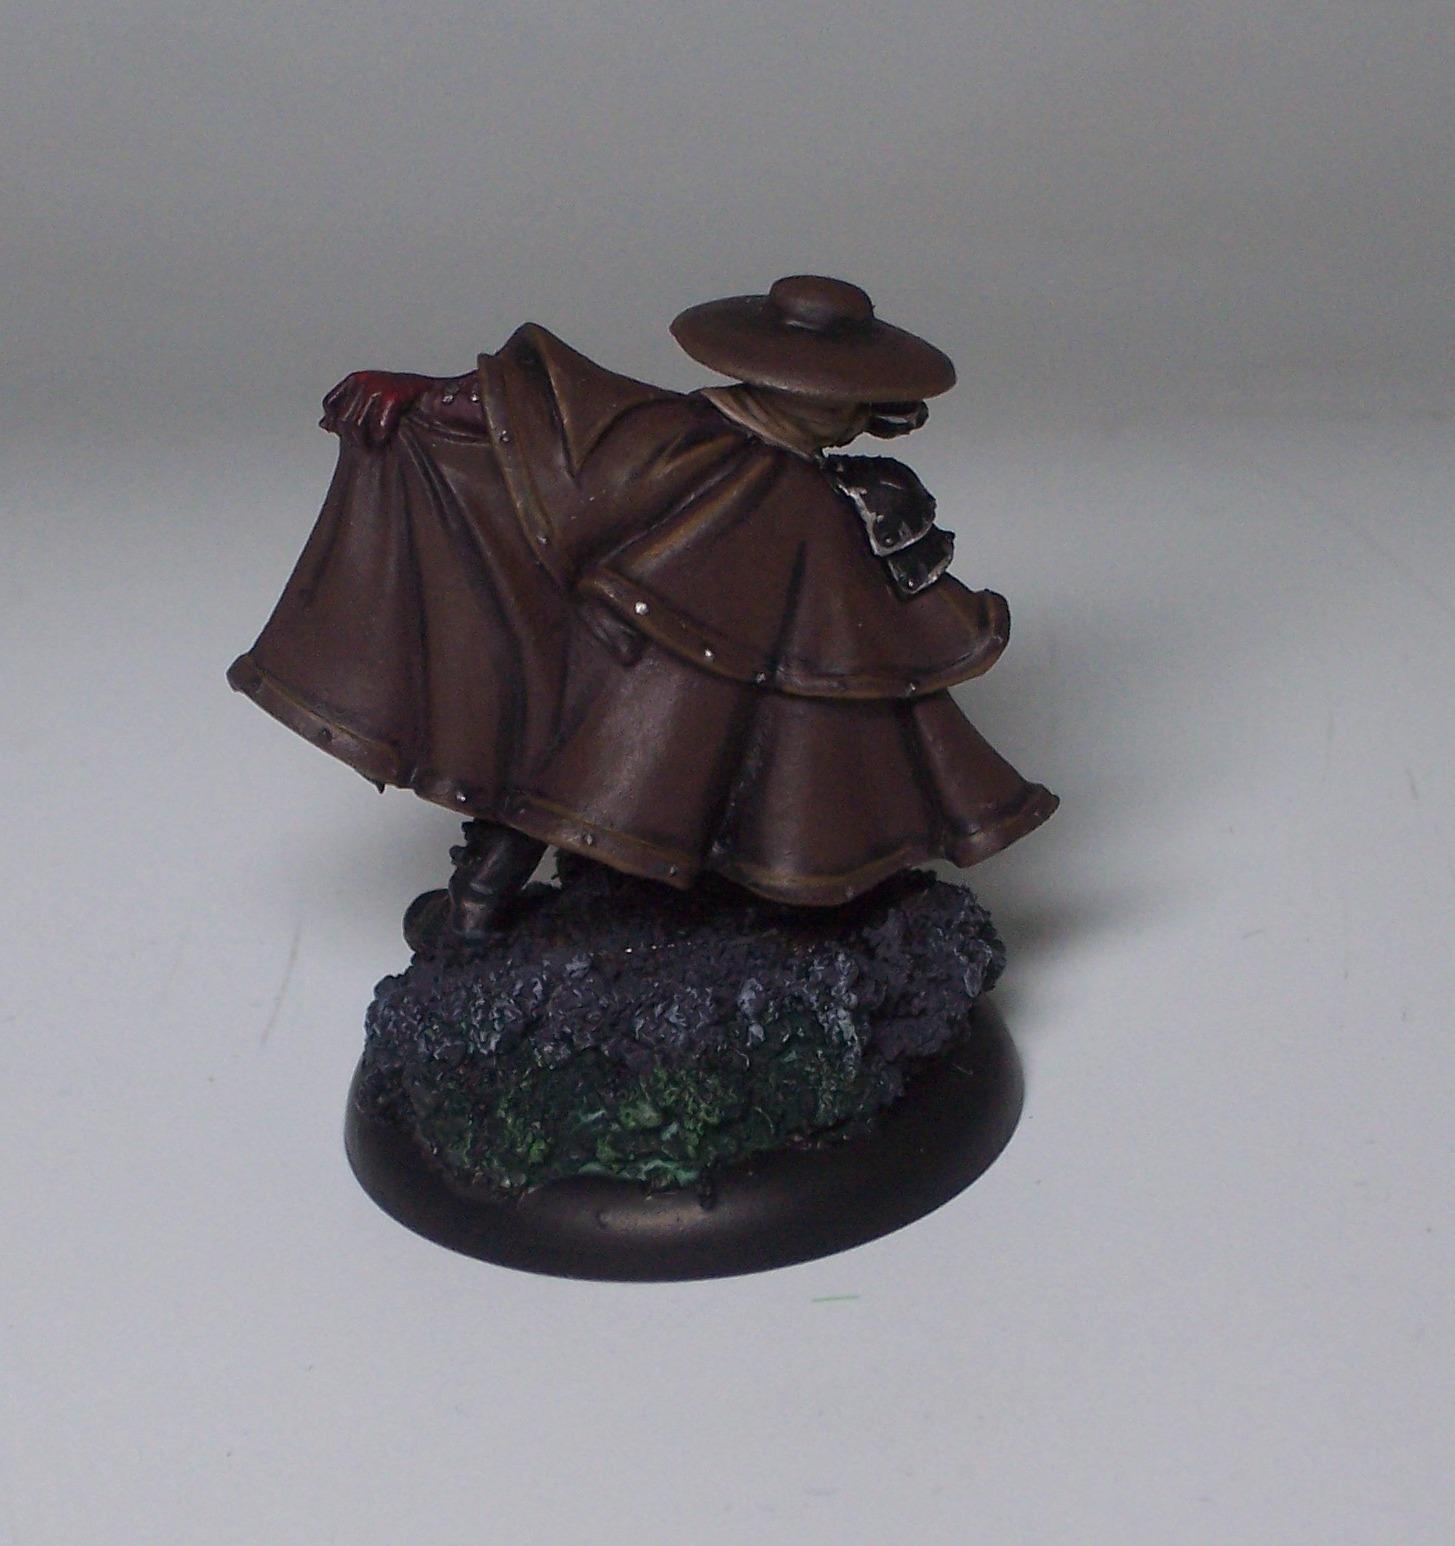 Gorman di Wulfe, Rogue Alchemist 2